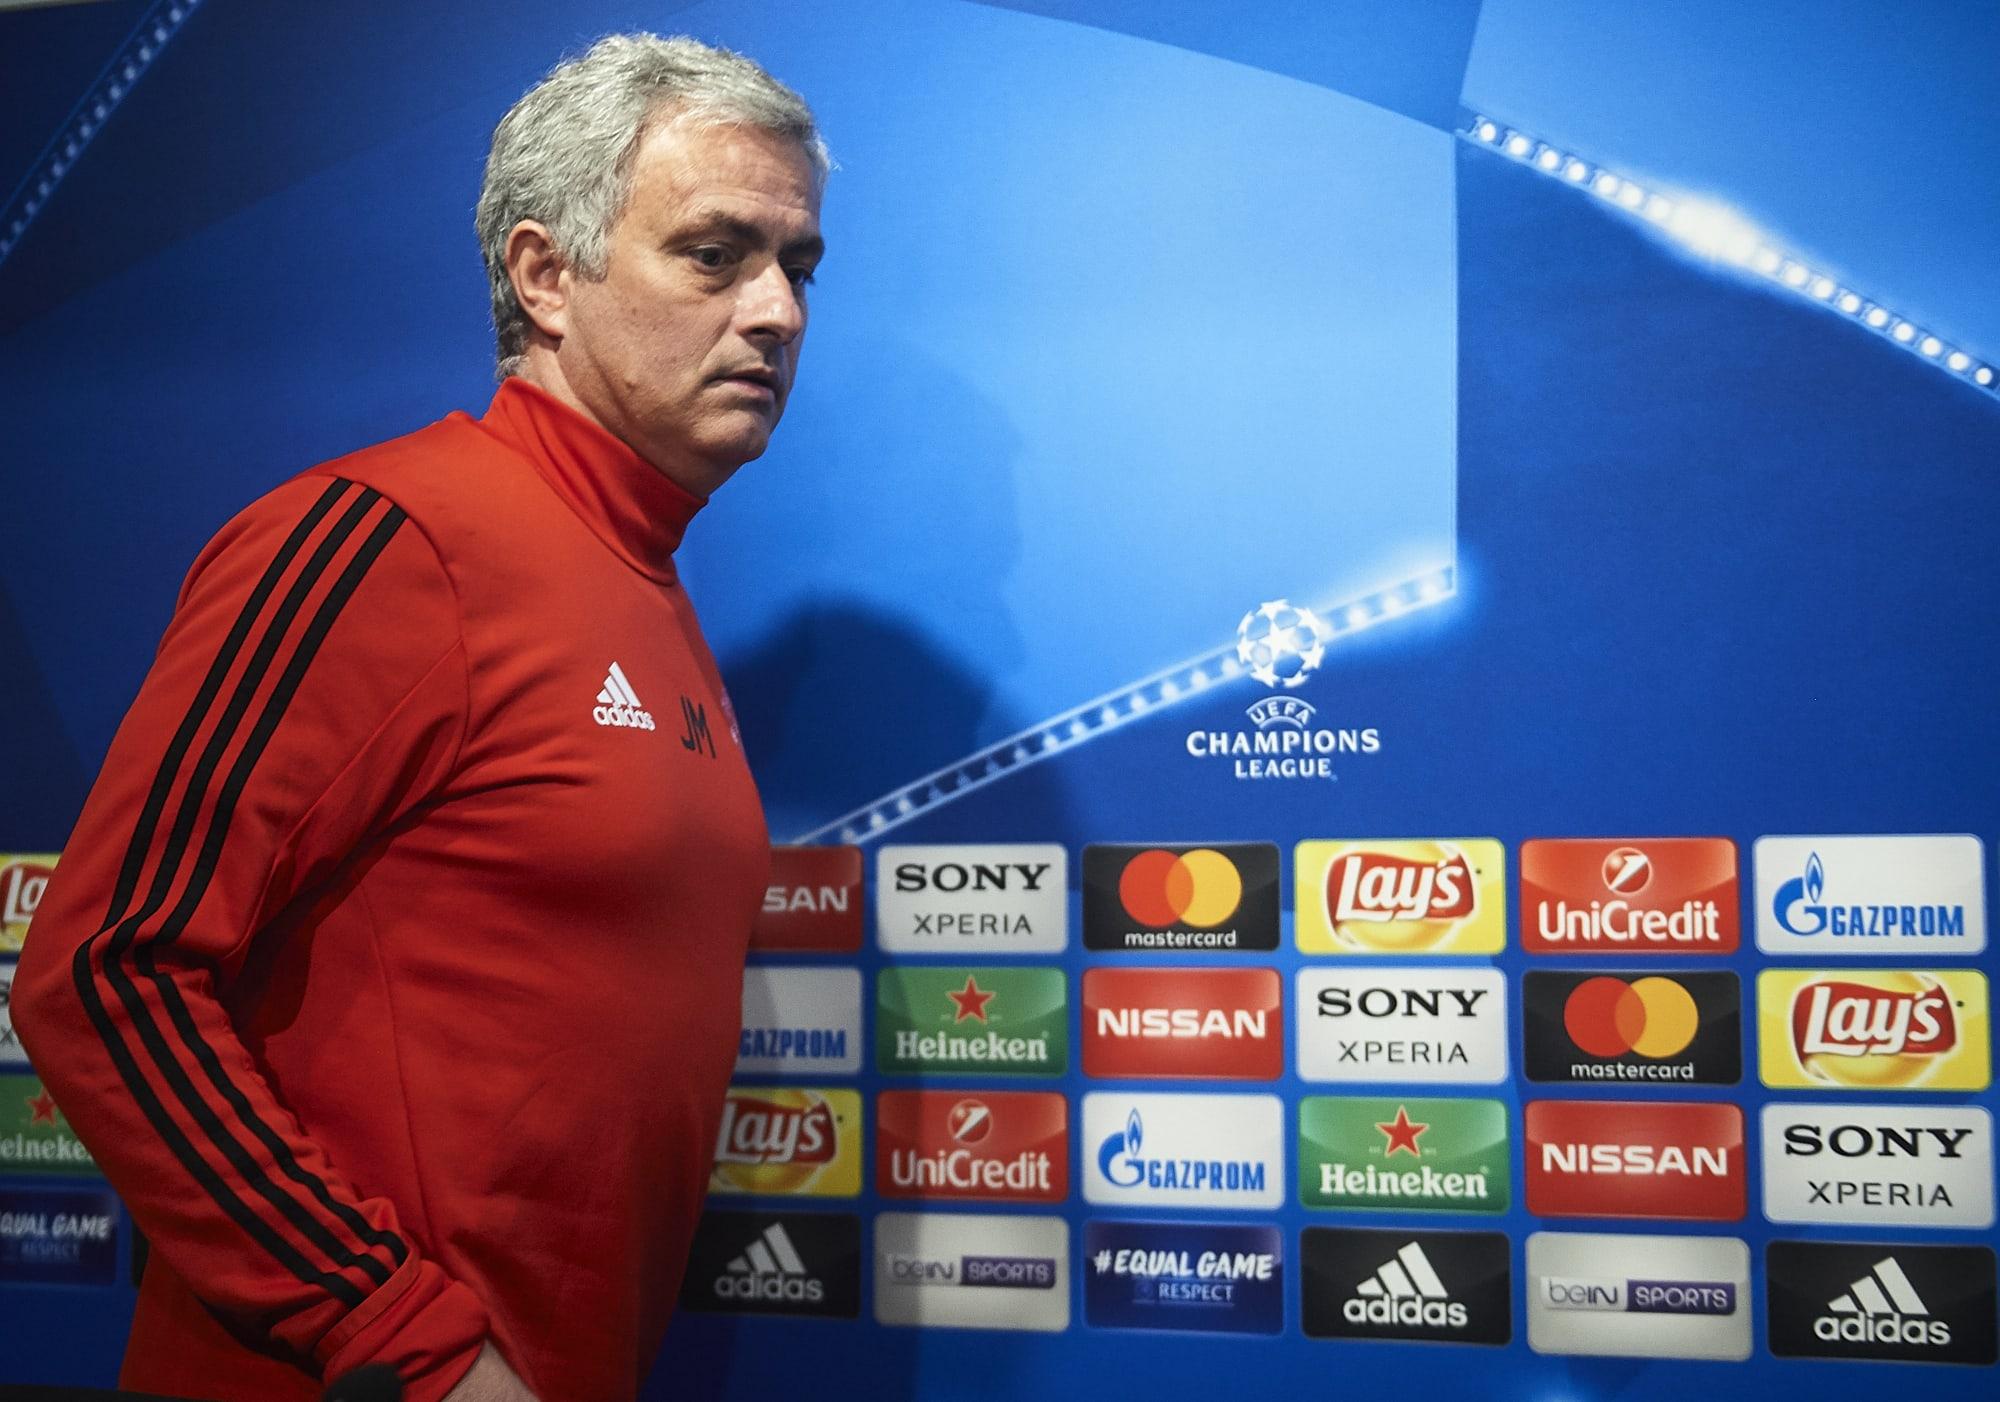 Champions League Preview: Manchester United vs Sevilla